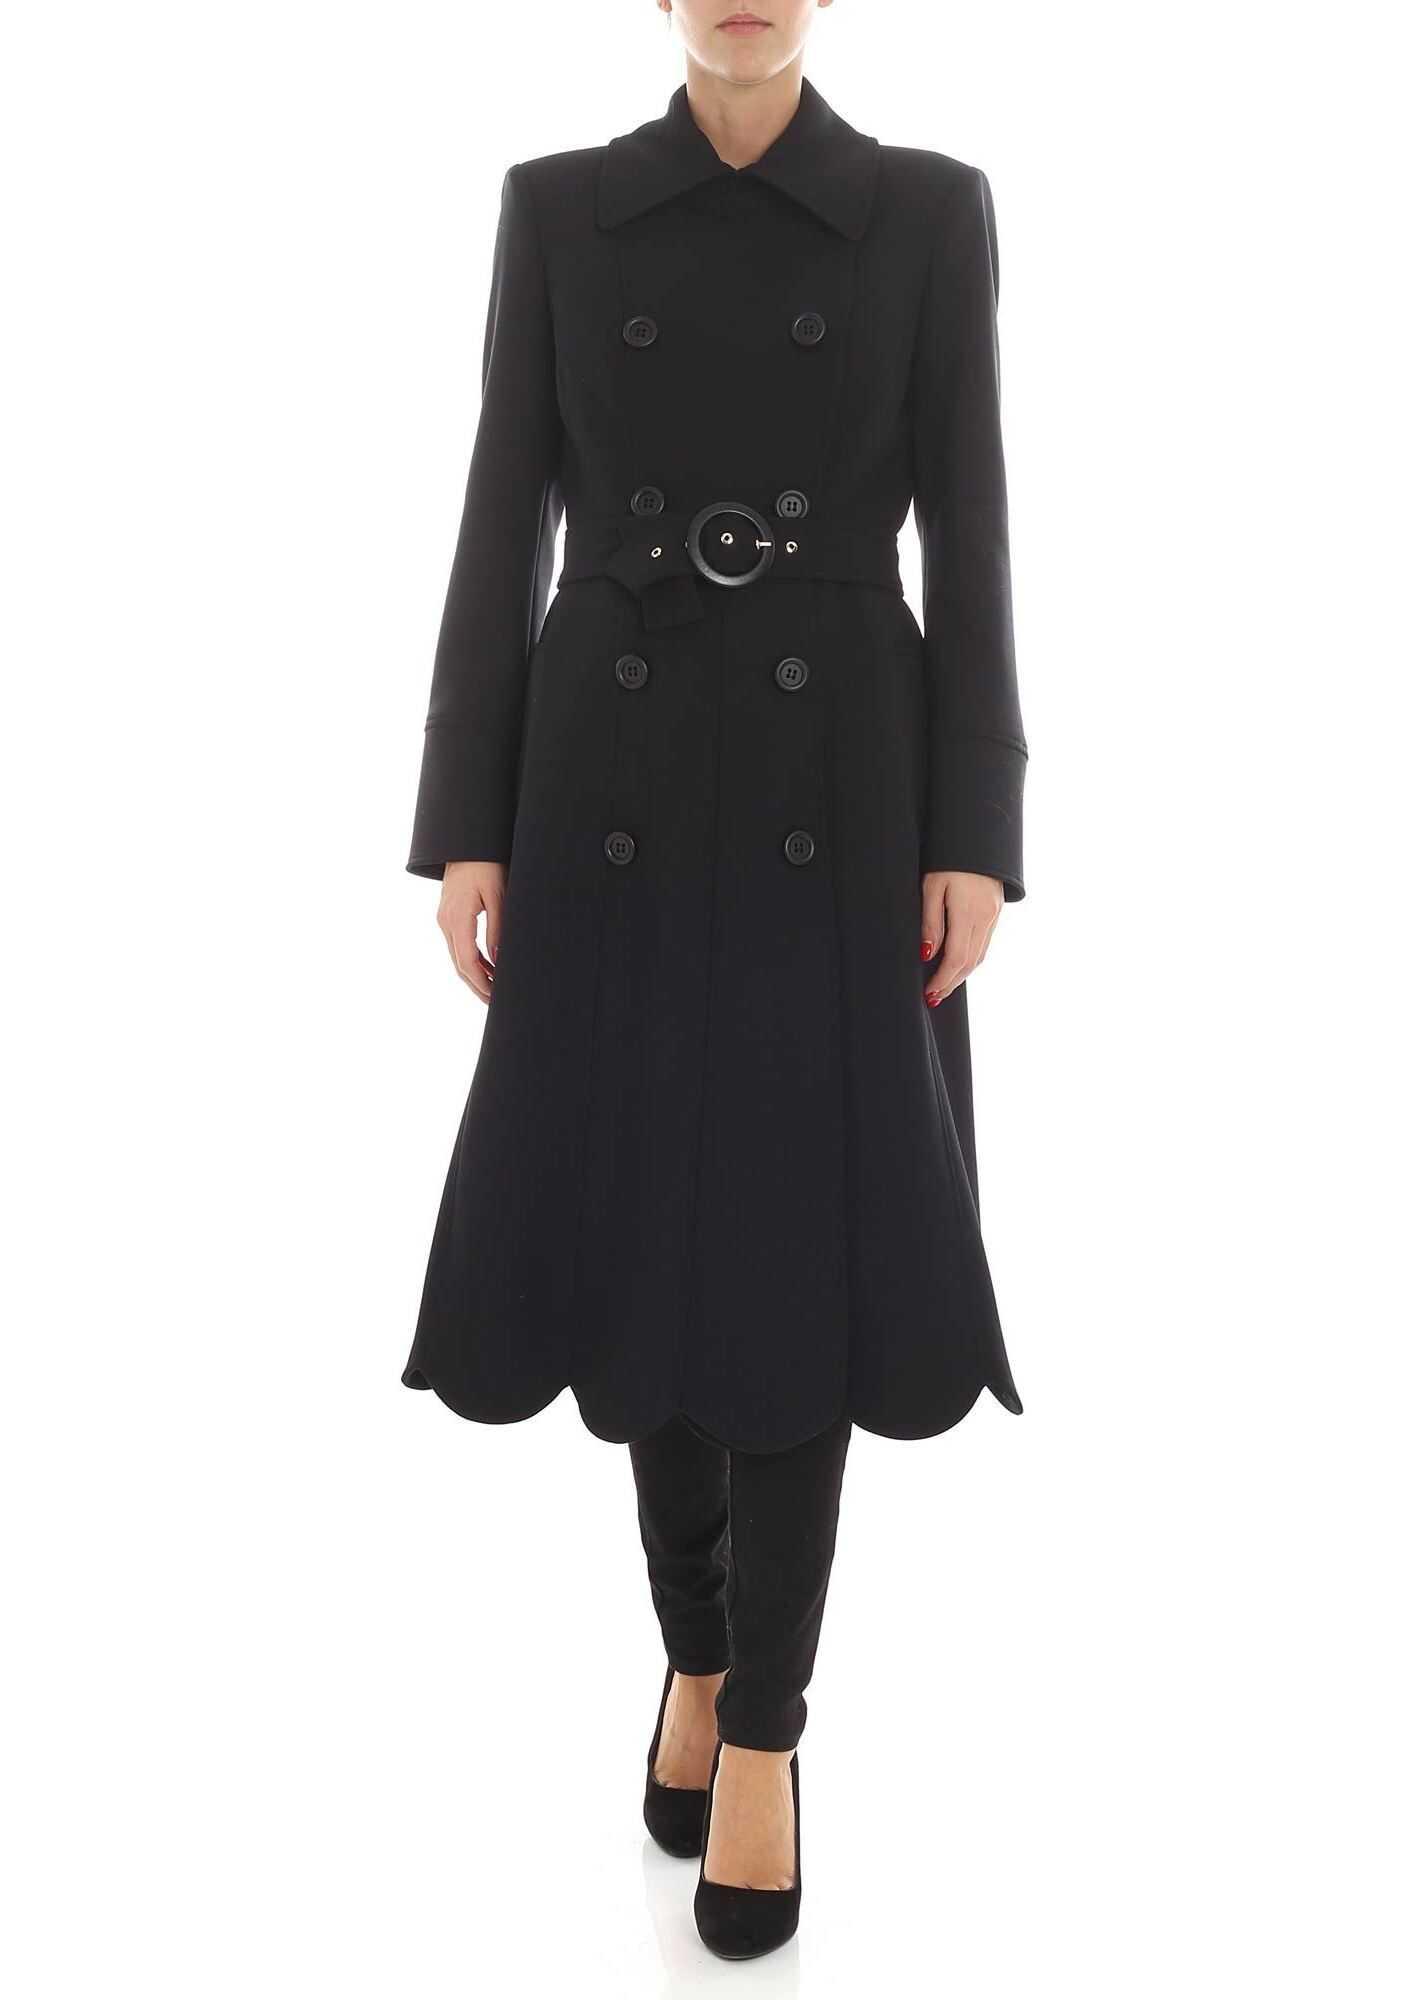 Elisabetta Franchi Black Coat With Asymmetric Bottom Black